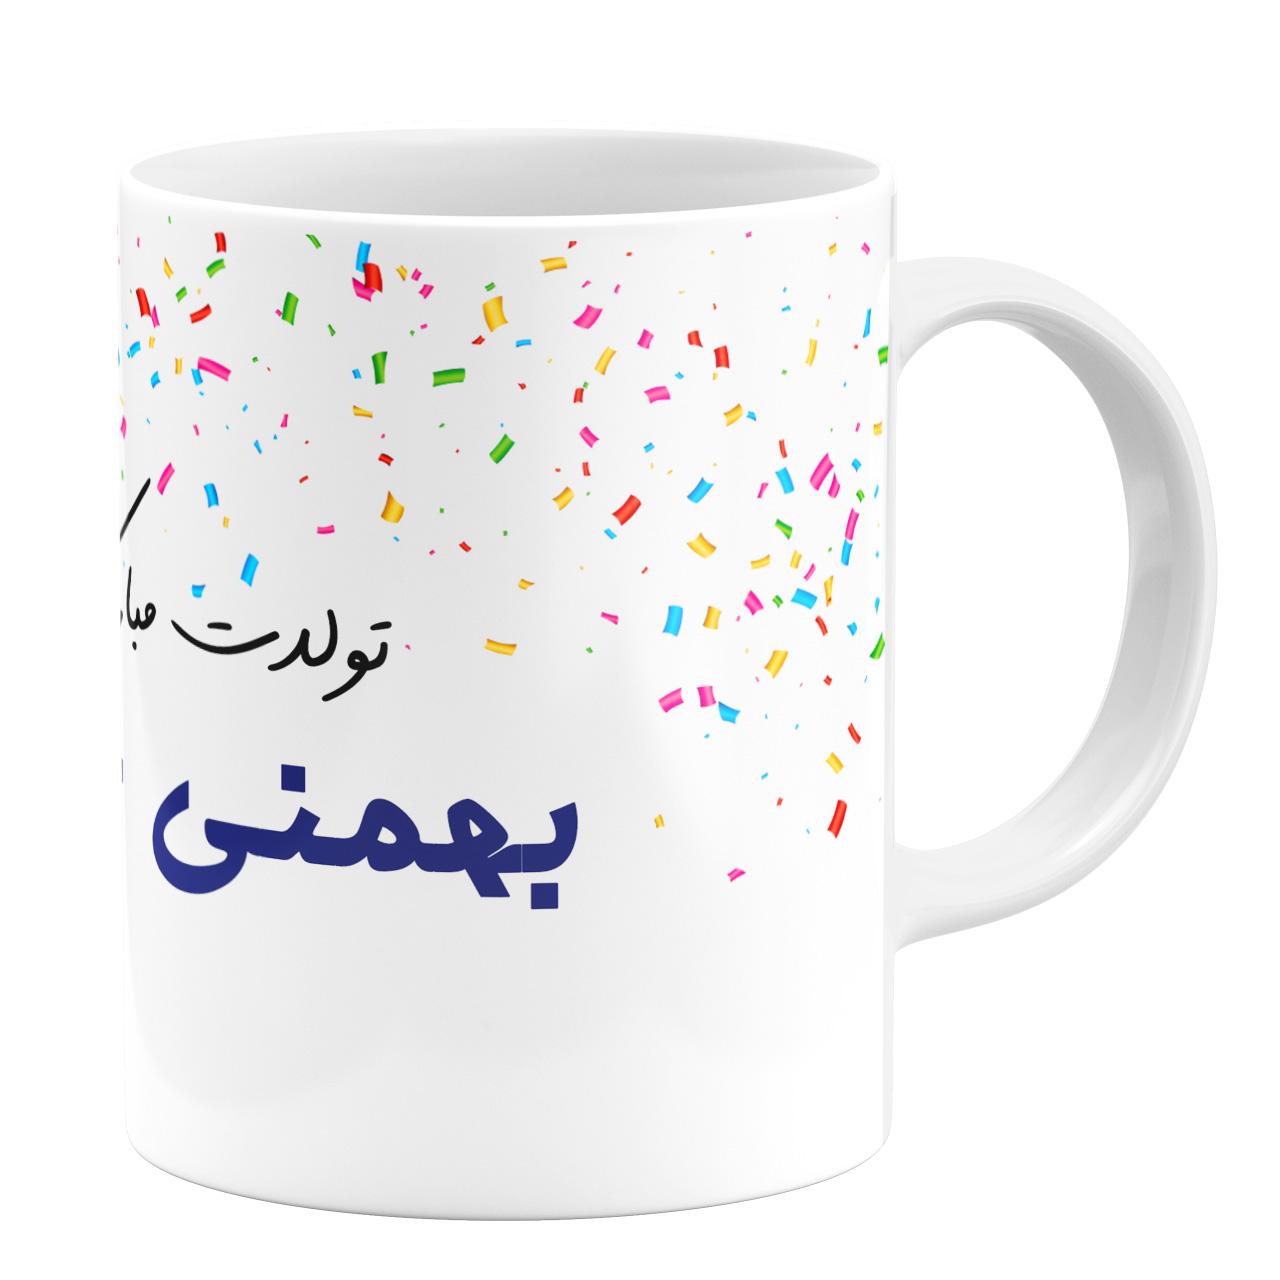 عکس ماگ طرح تولد بهمن ماهی کد 11053891